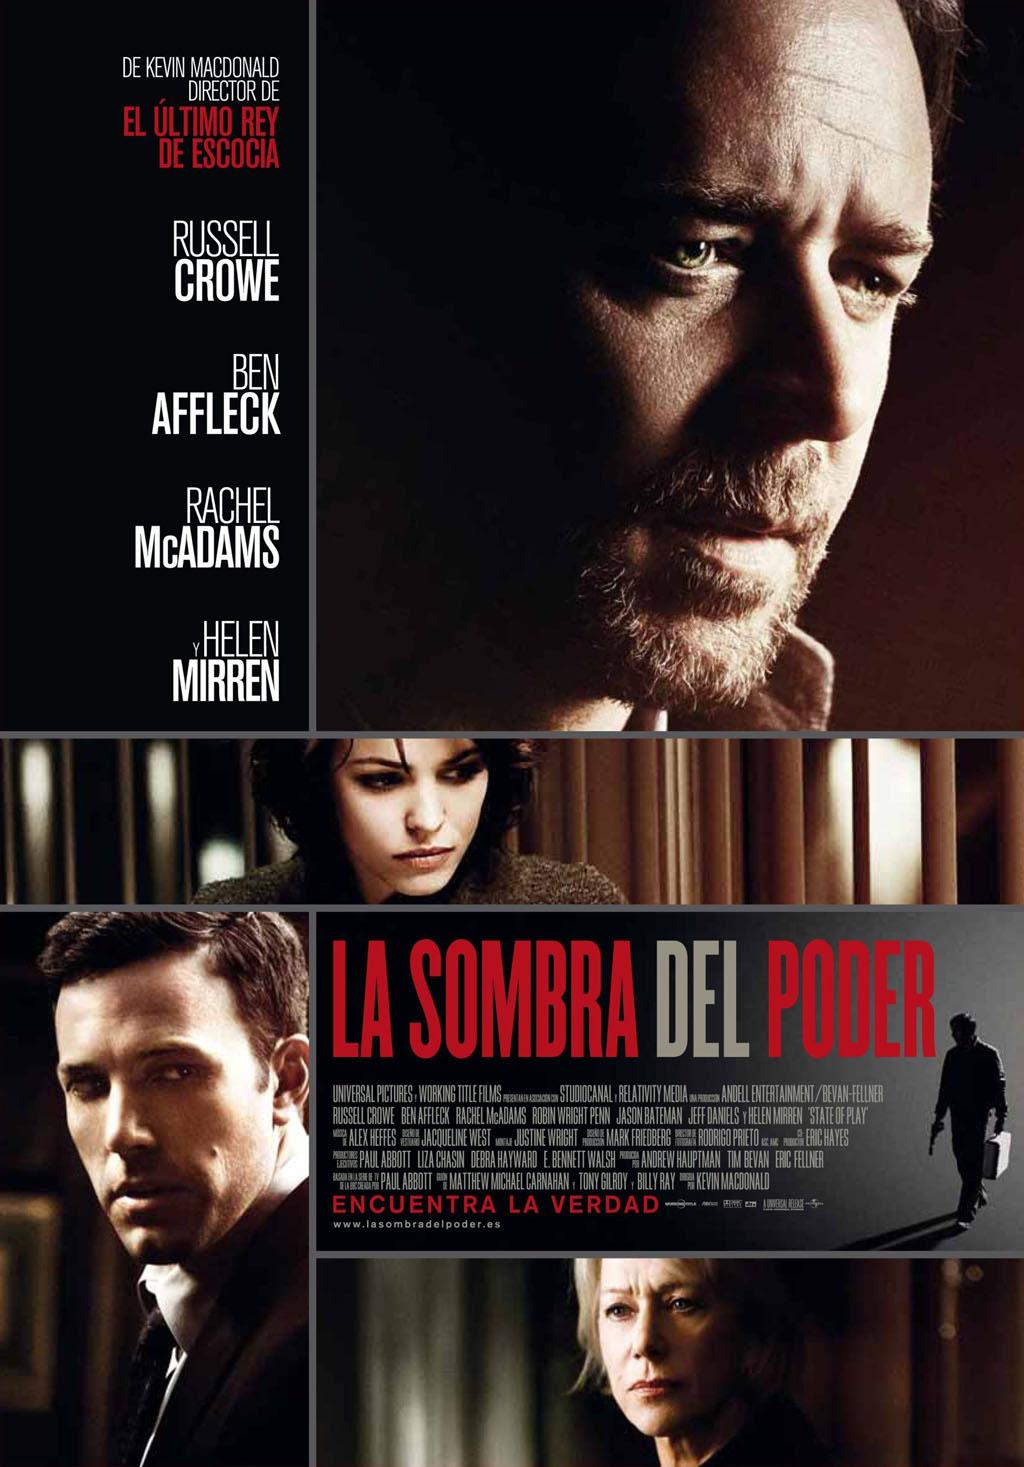 http://2.bp.blogspot.com/-Od3G6PM_94Y/TWkbasBE7MI/AAAAAAAADdw/sdL4alB_GyY/s1600/La_Sombra_Del_Poder-Cartel.jpg